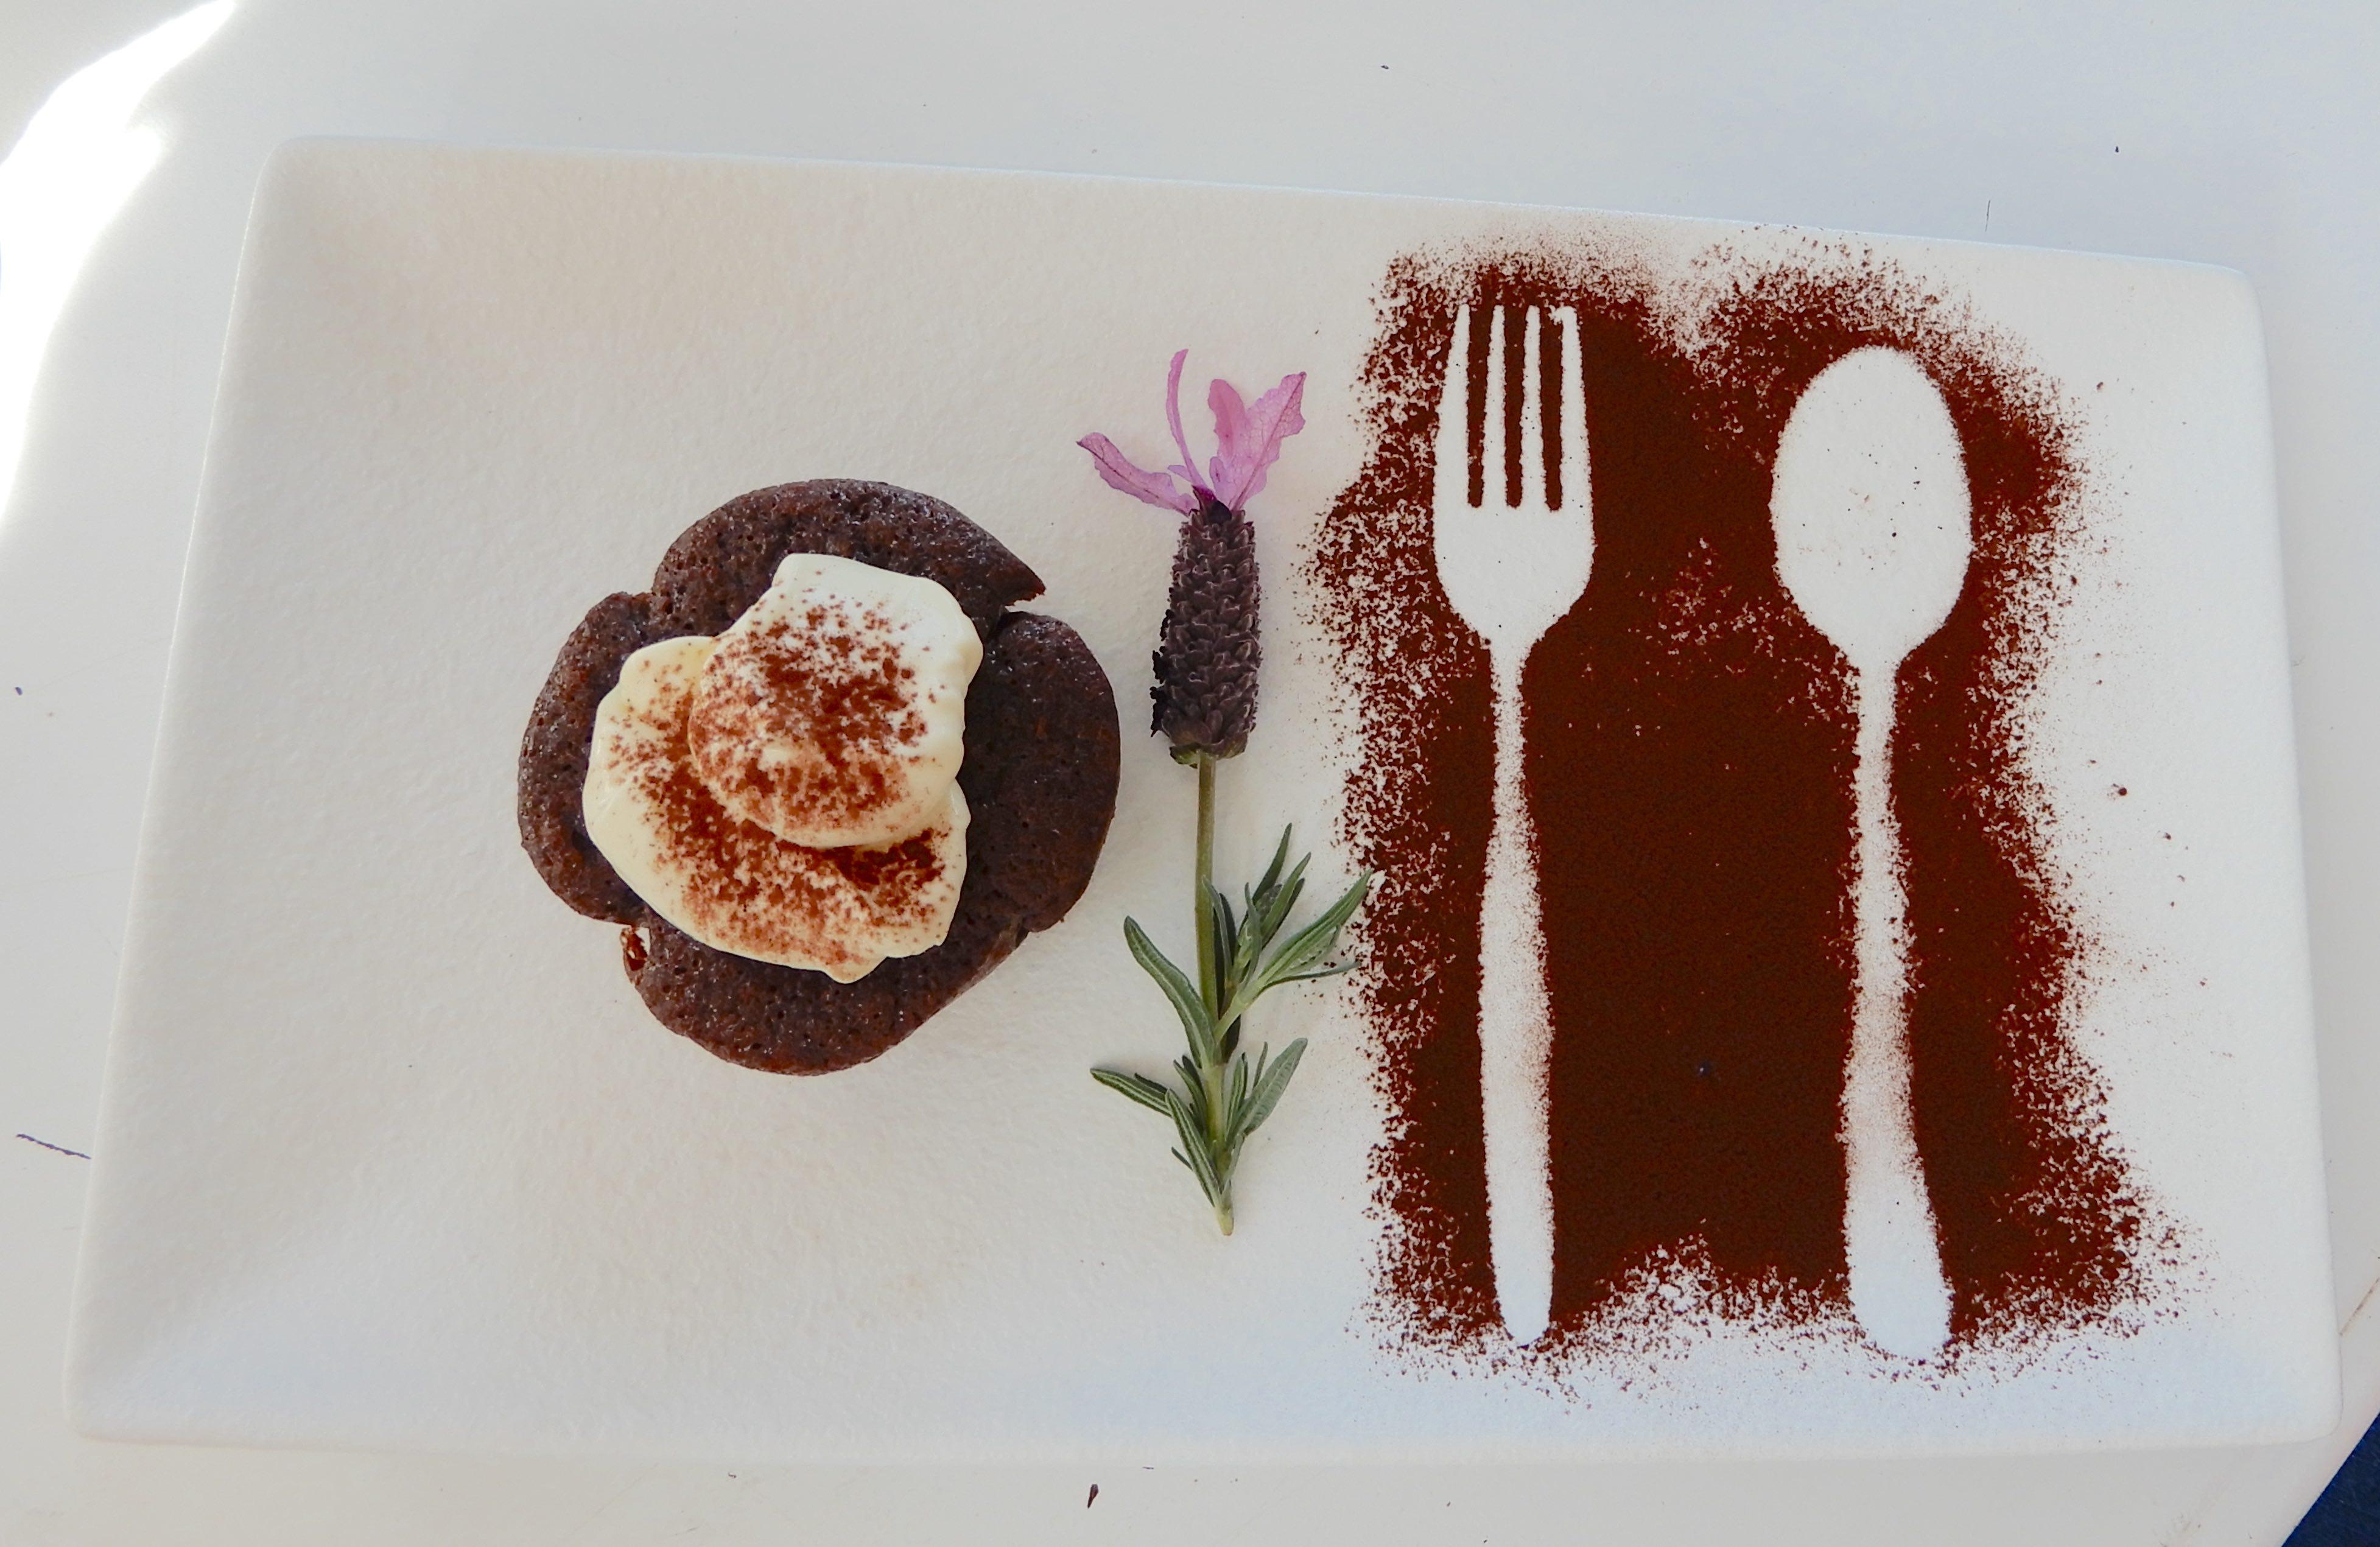 23.Chocolate Bliss Mini Cake